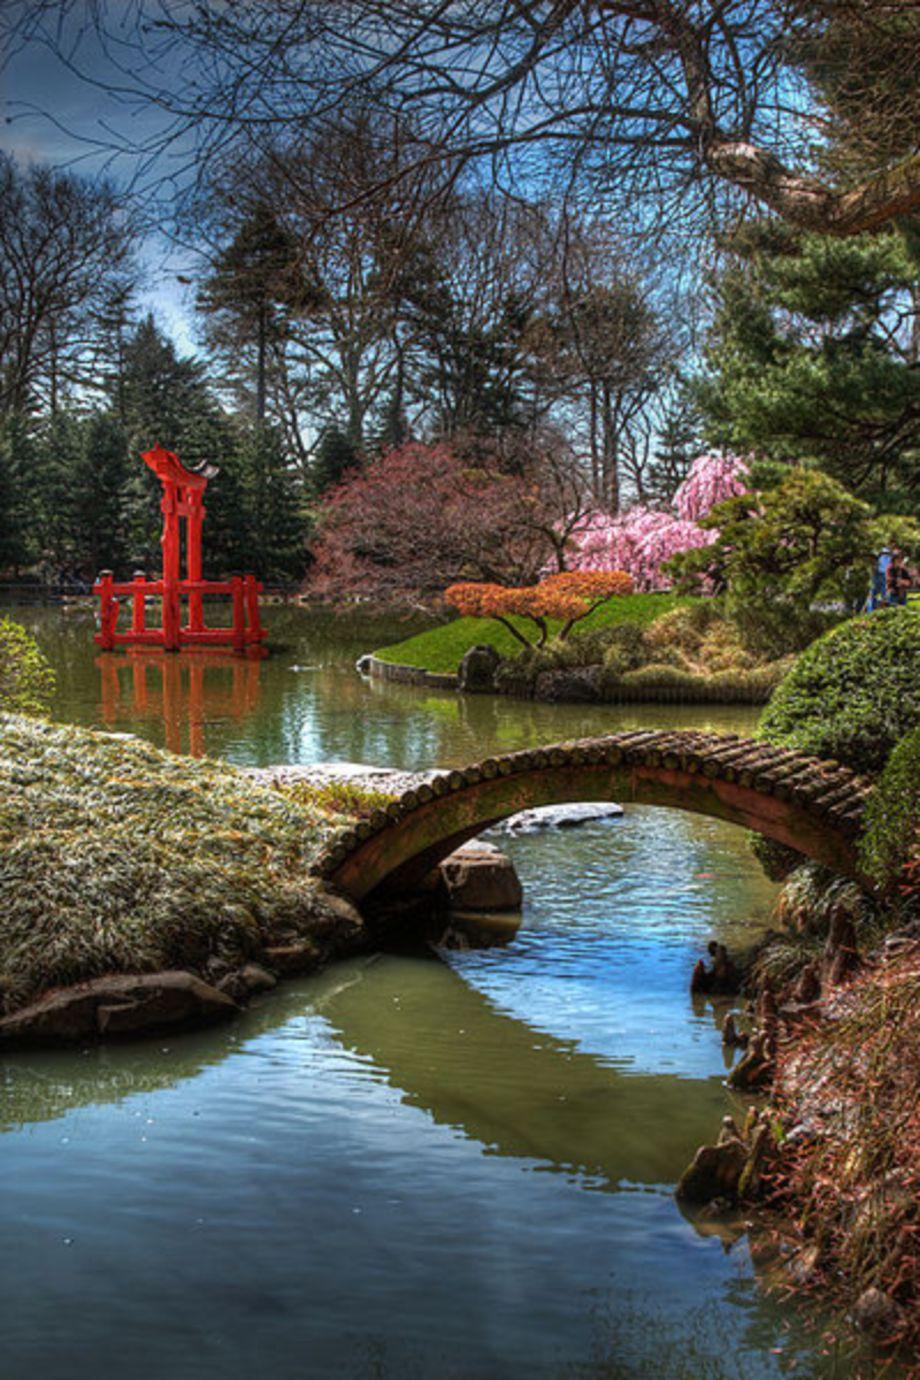 28 Japanese Garden Design Ideas To Style Up Your Backyard: Stunning Japanese Garden Ideas Plants You Will Love 31